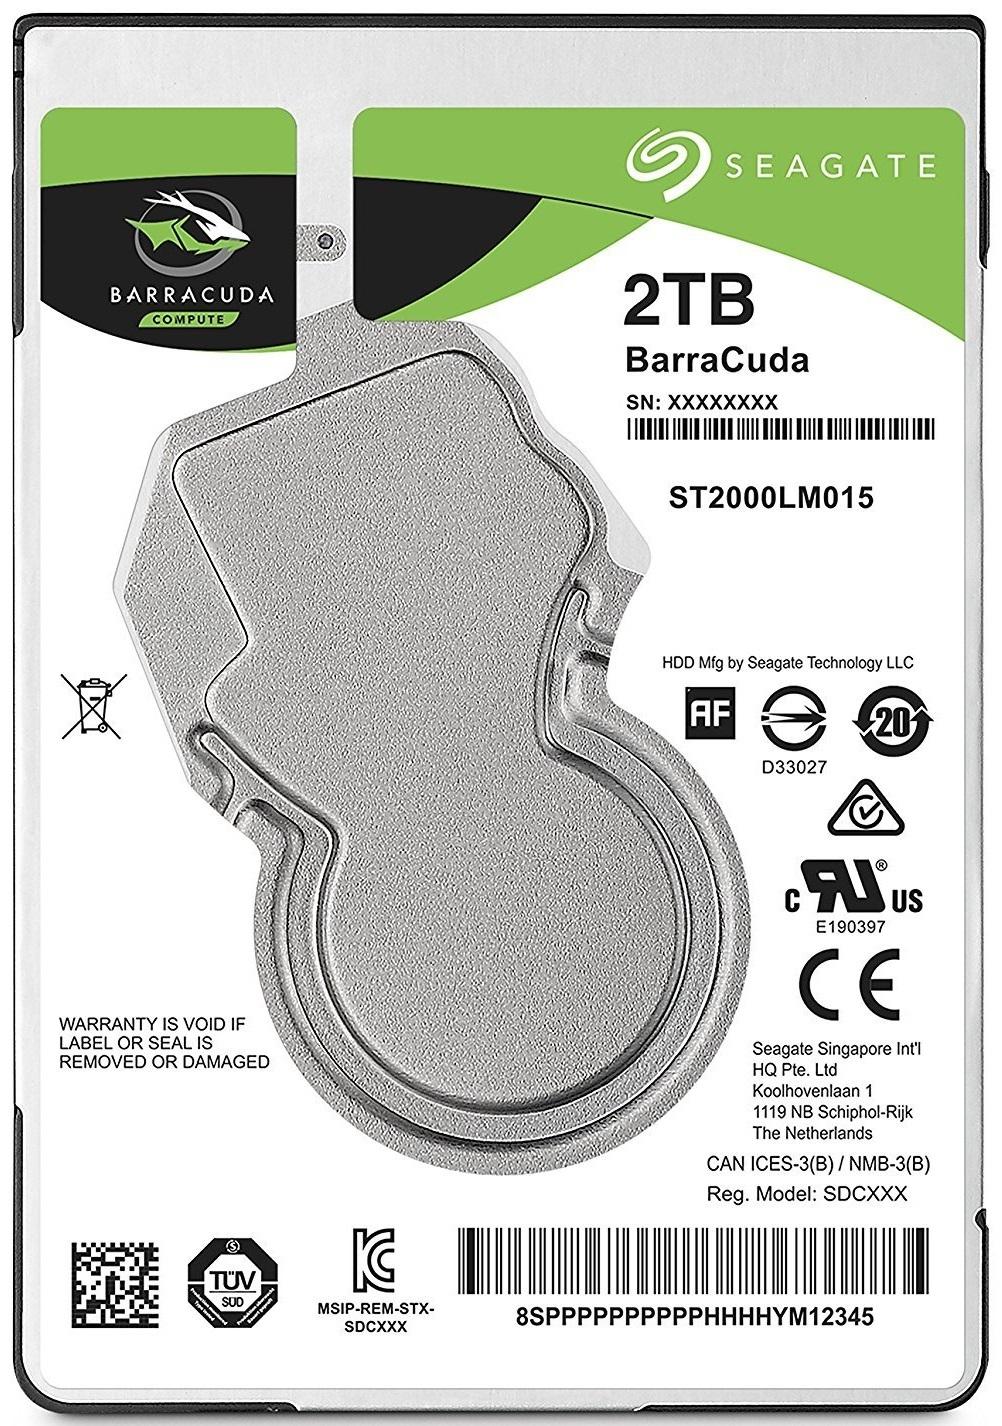 2TB Seagate Barracuda Sata 6GB/s 128MB Cache 2.5-Inch 7mm Internal Hard Drive image